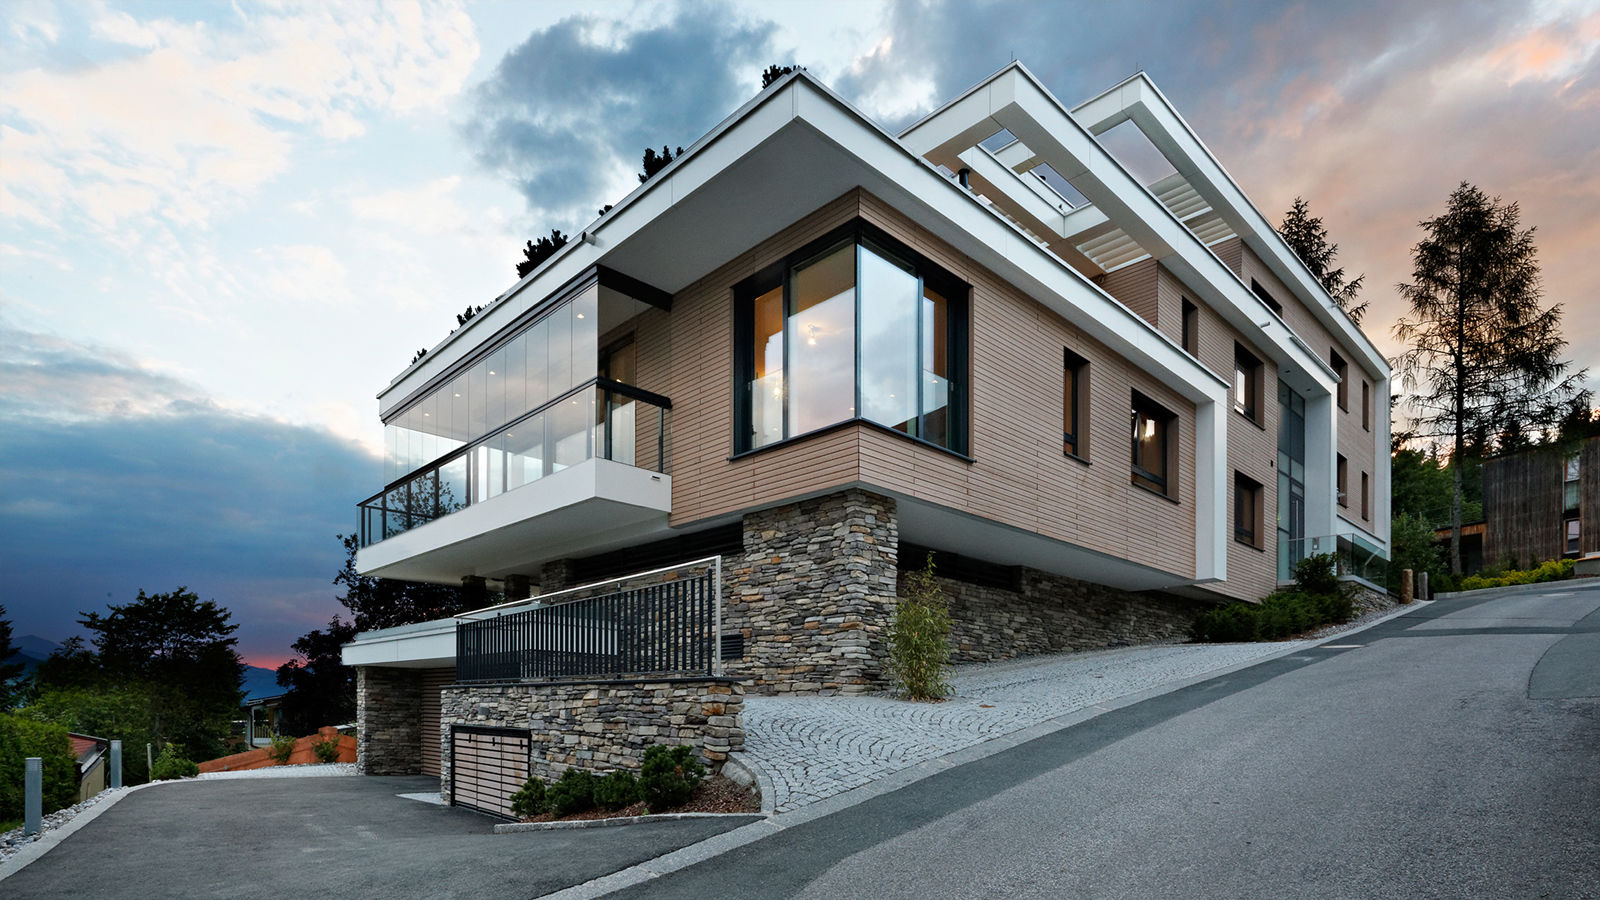 Haus salvenblick planquadrat - Planquadrat architekten ...